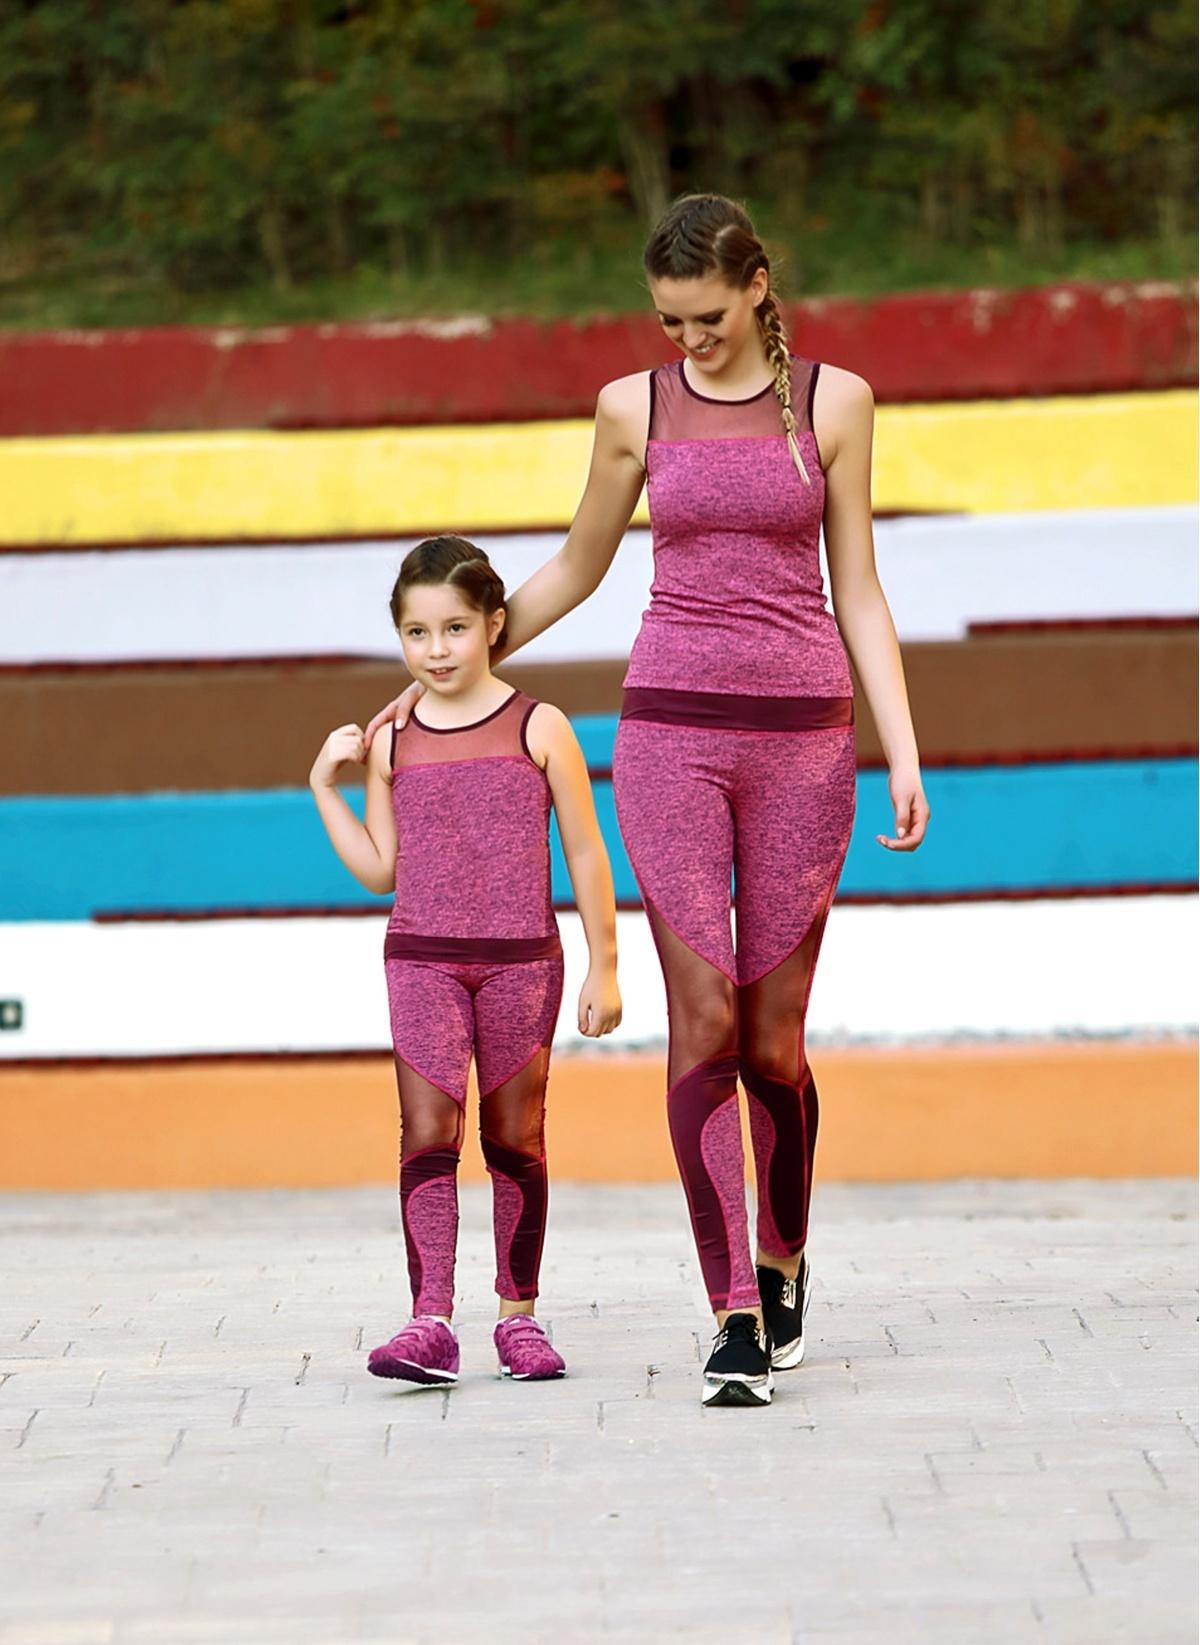 Lingabooms 2 Li Takım Mgp9344 Kadın Pembe Kadın Atlet Tayt Ta – 129.9 TL